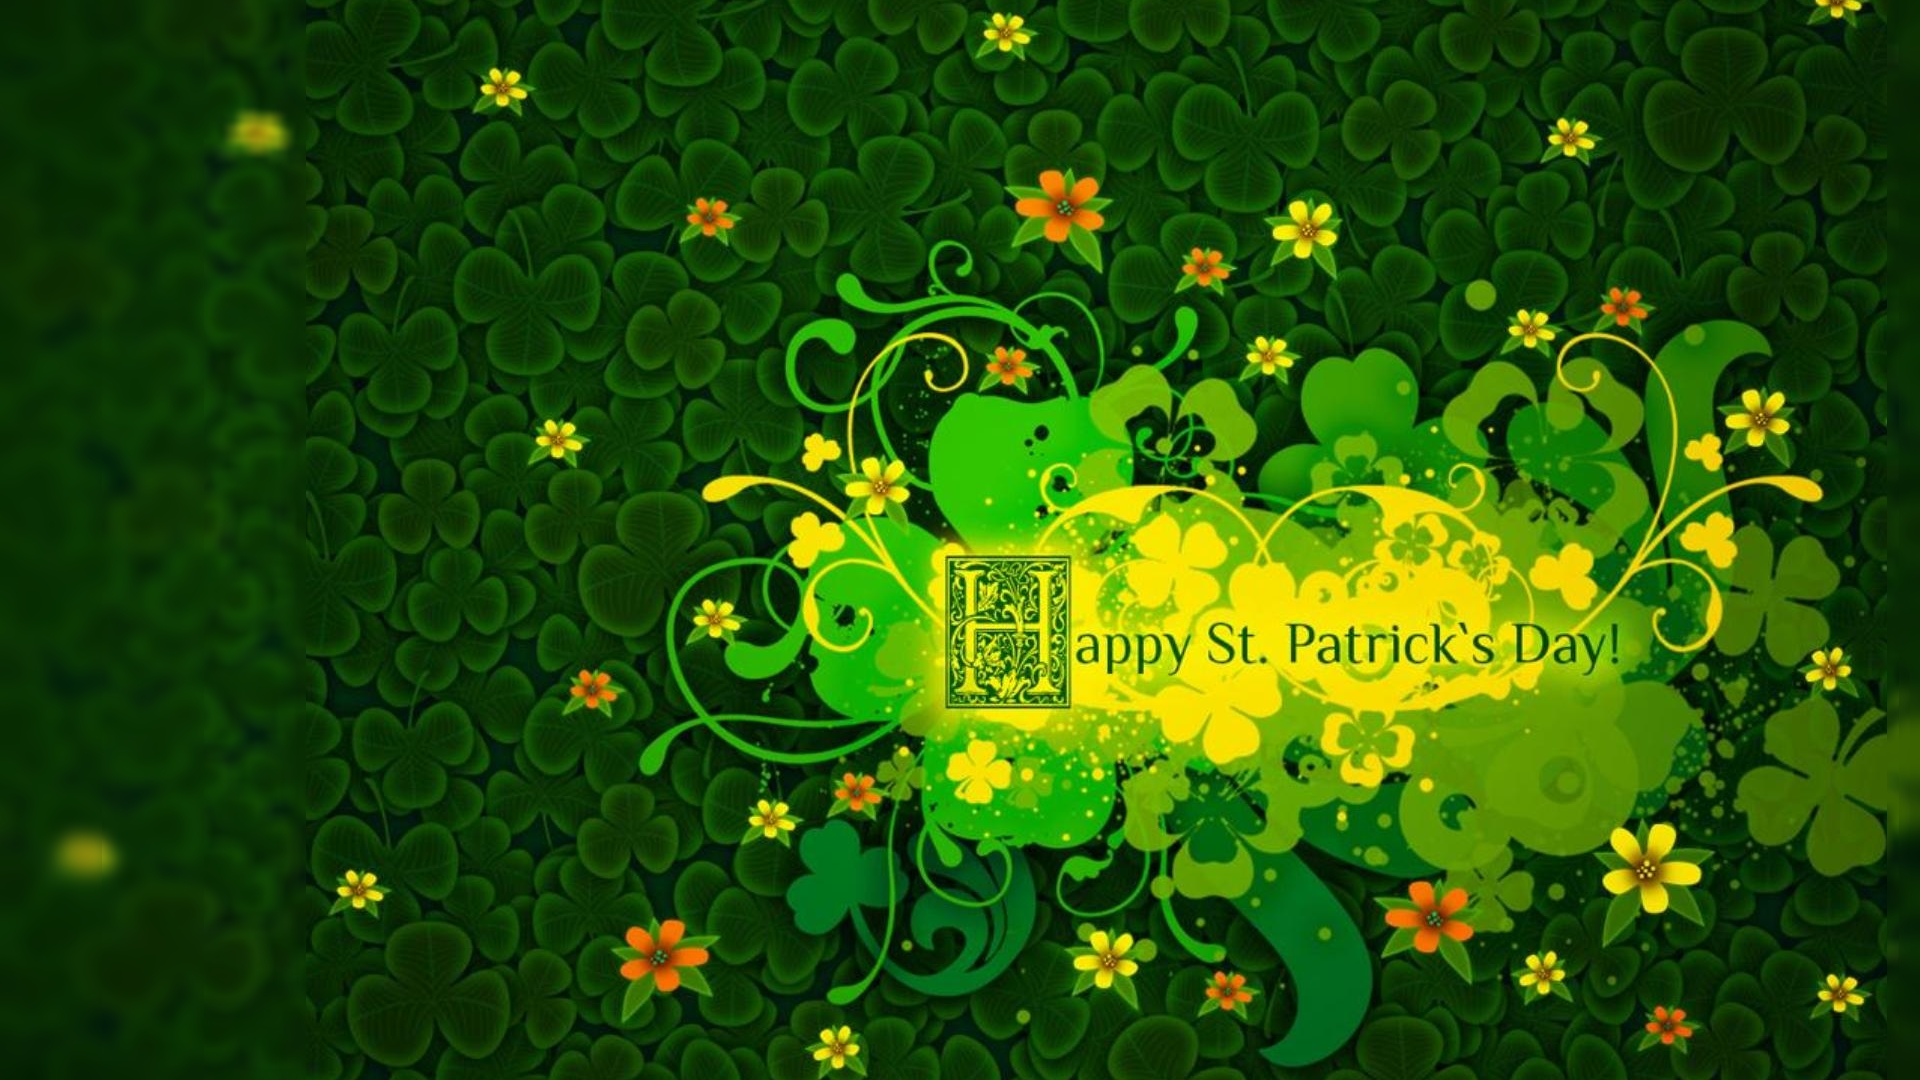 St Patricks Day Desktop Wallpaper 40632 Hd Wallpapers 1920x1080